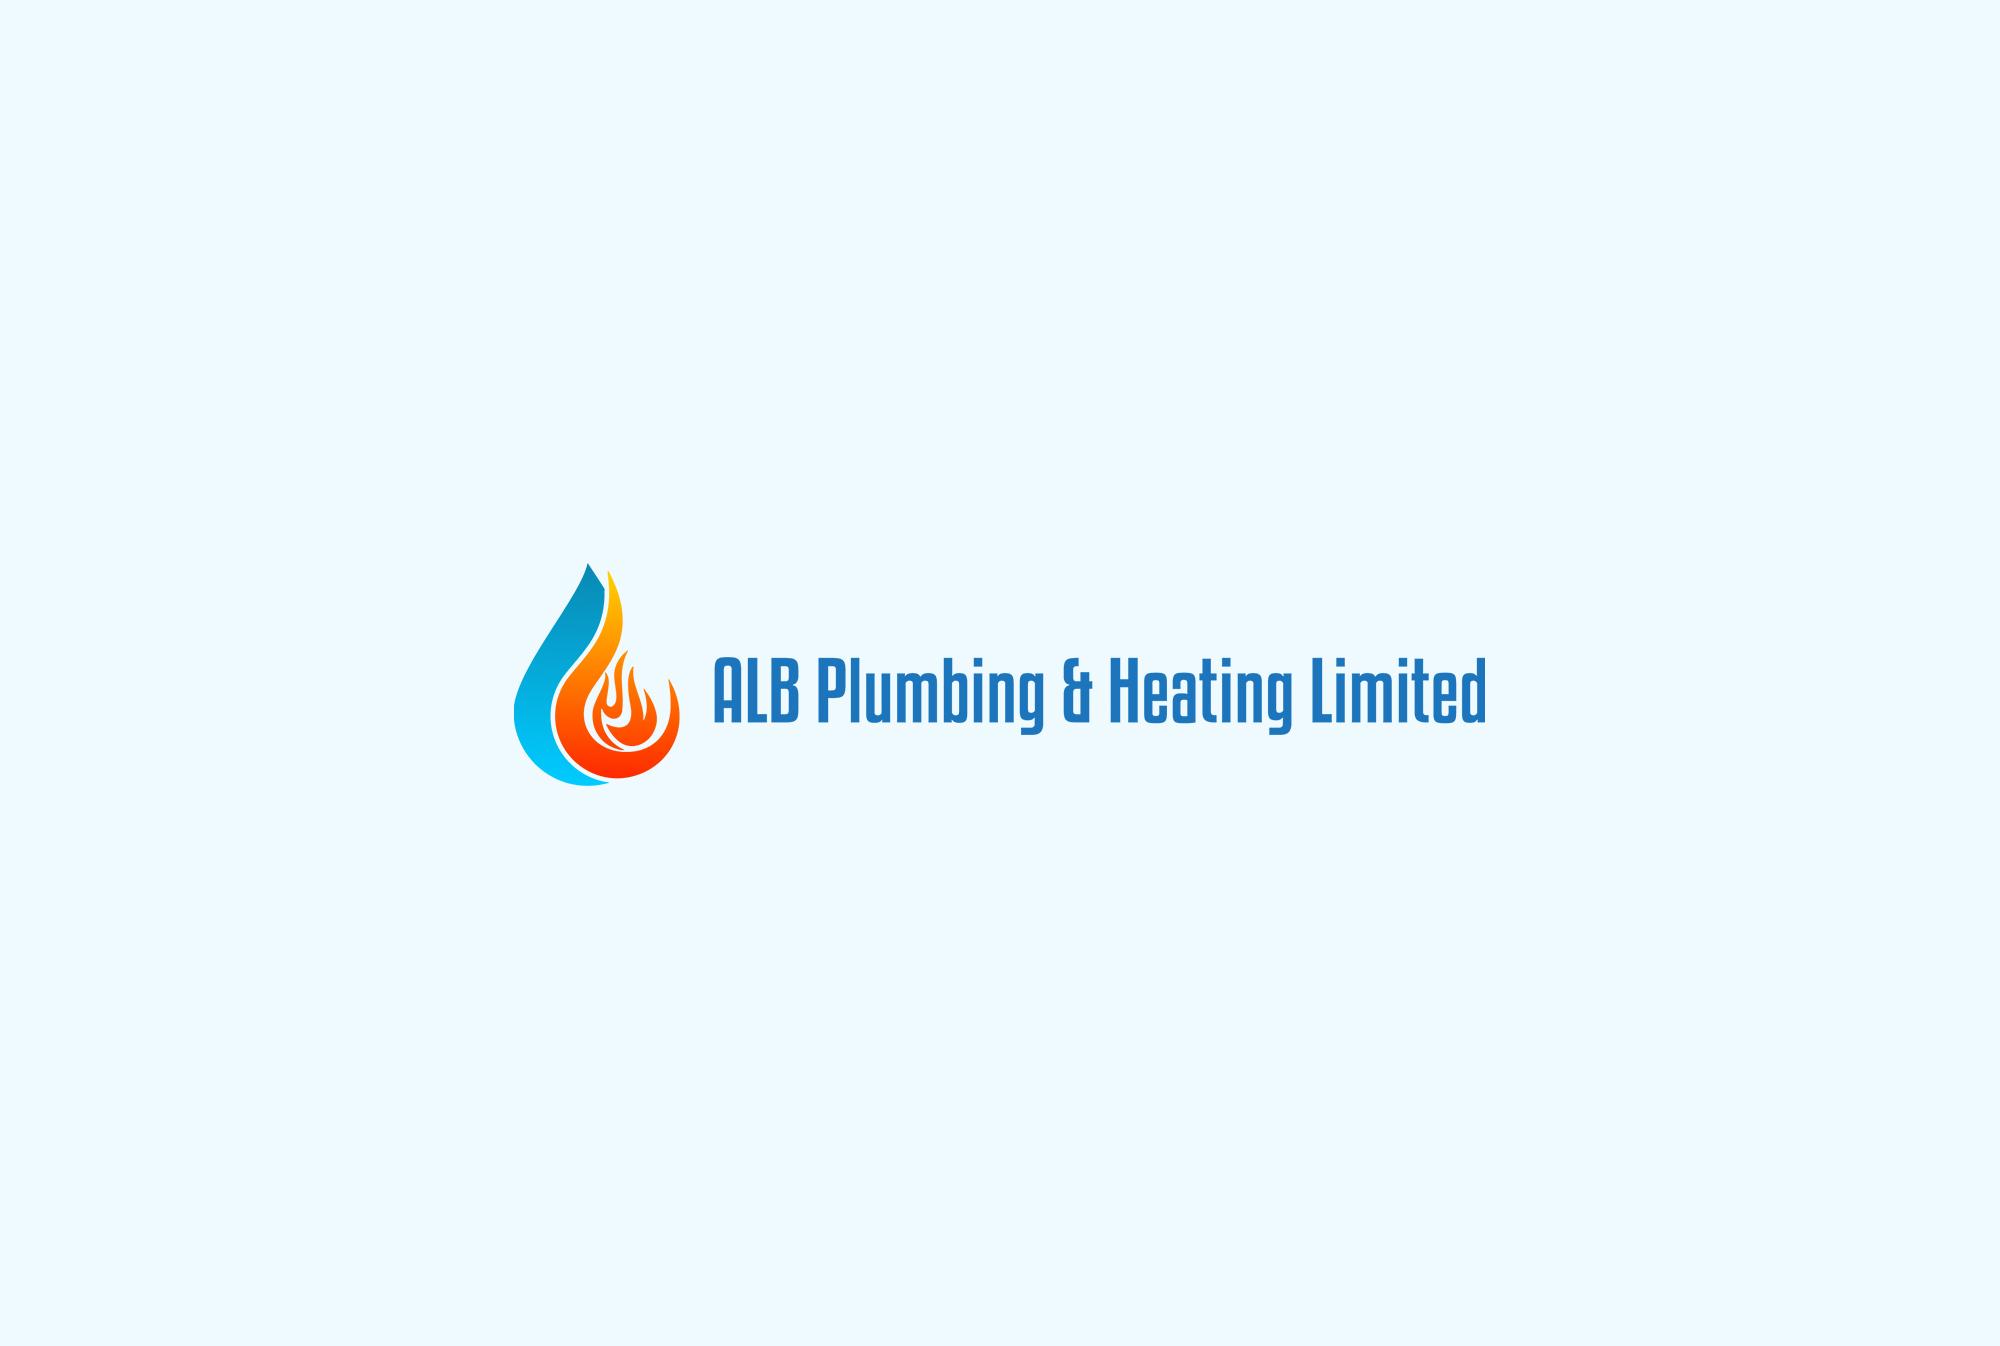 ALB Plumbing & Heating Limited